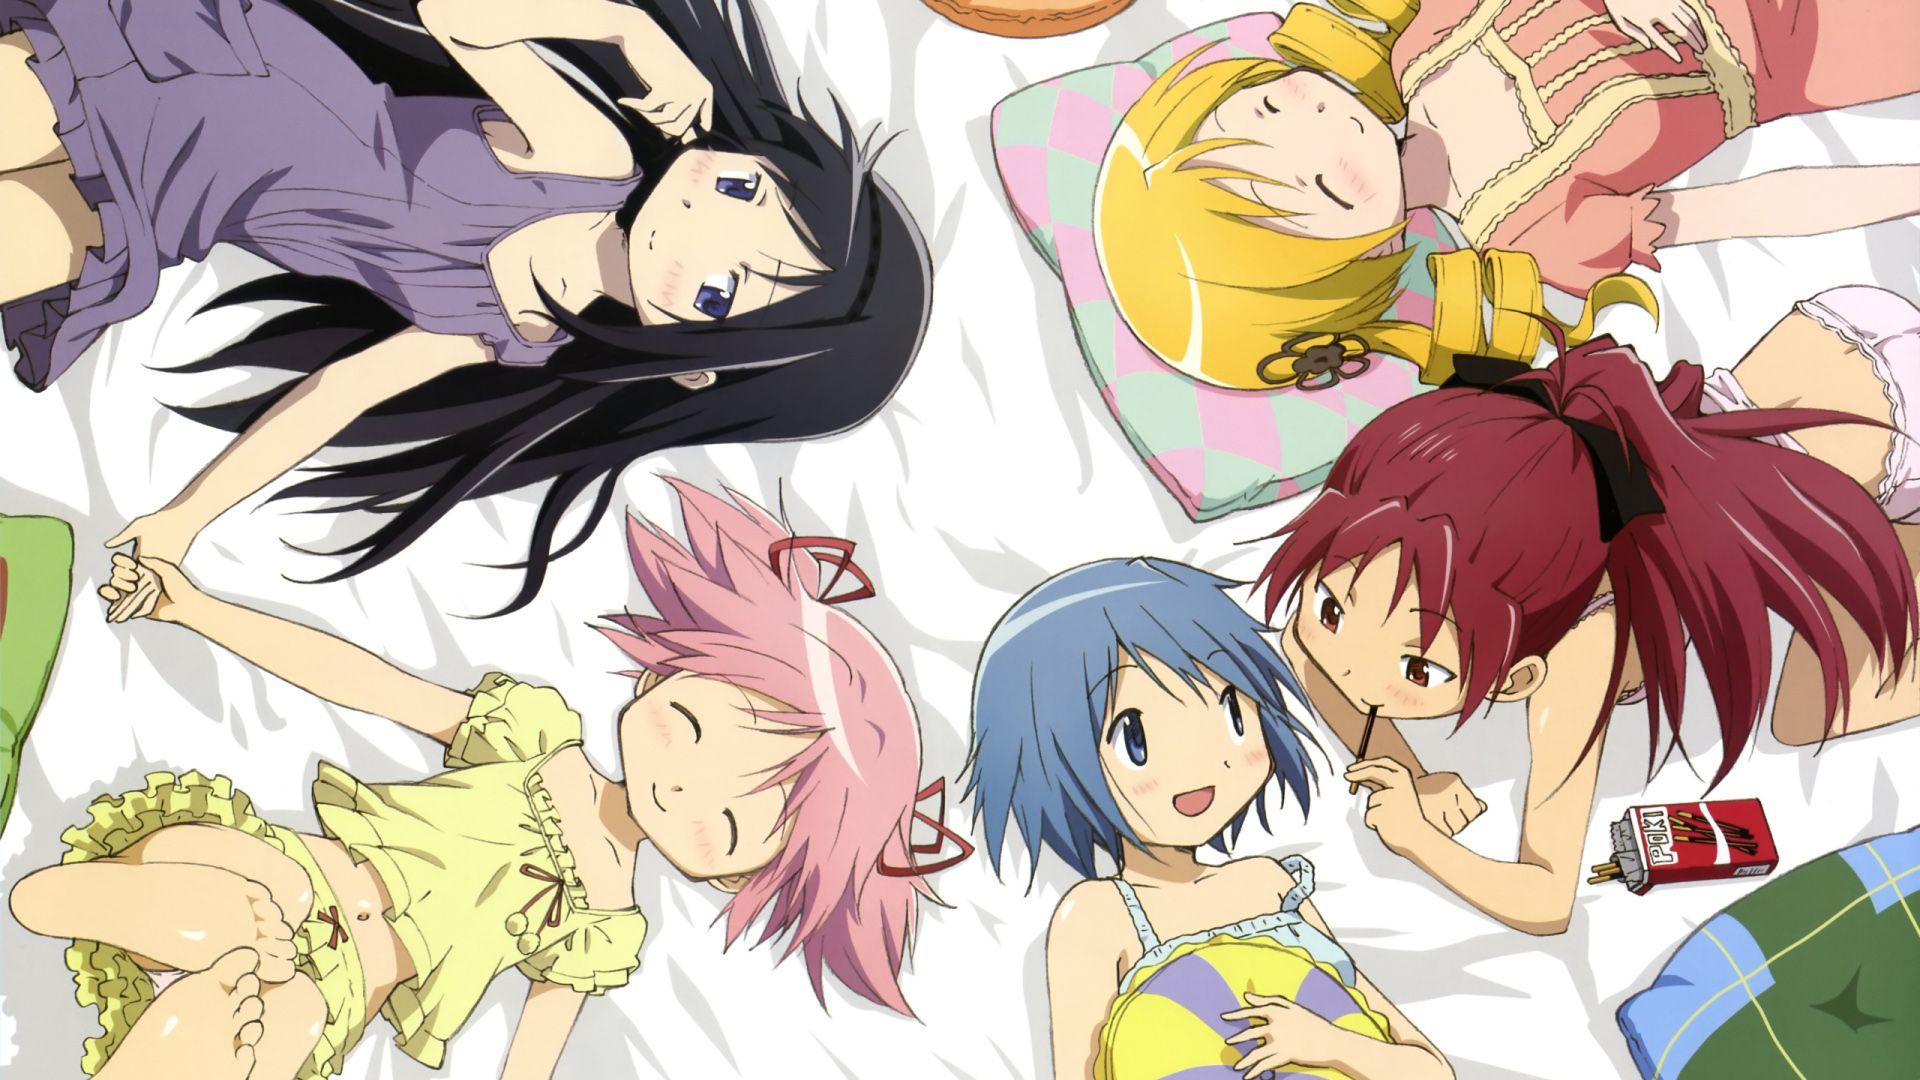 [Top 10] Animes que Merecem vir pro Brasil Dublados Afffcd6d69948acba8c783c0d1fee92d